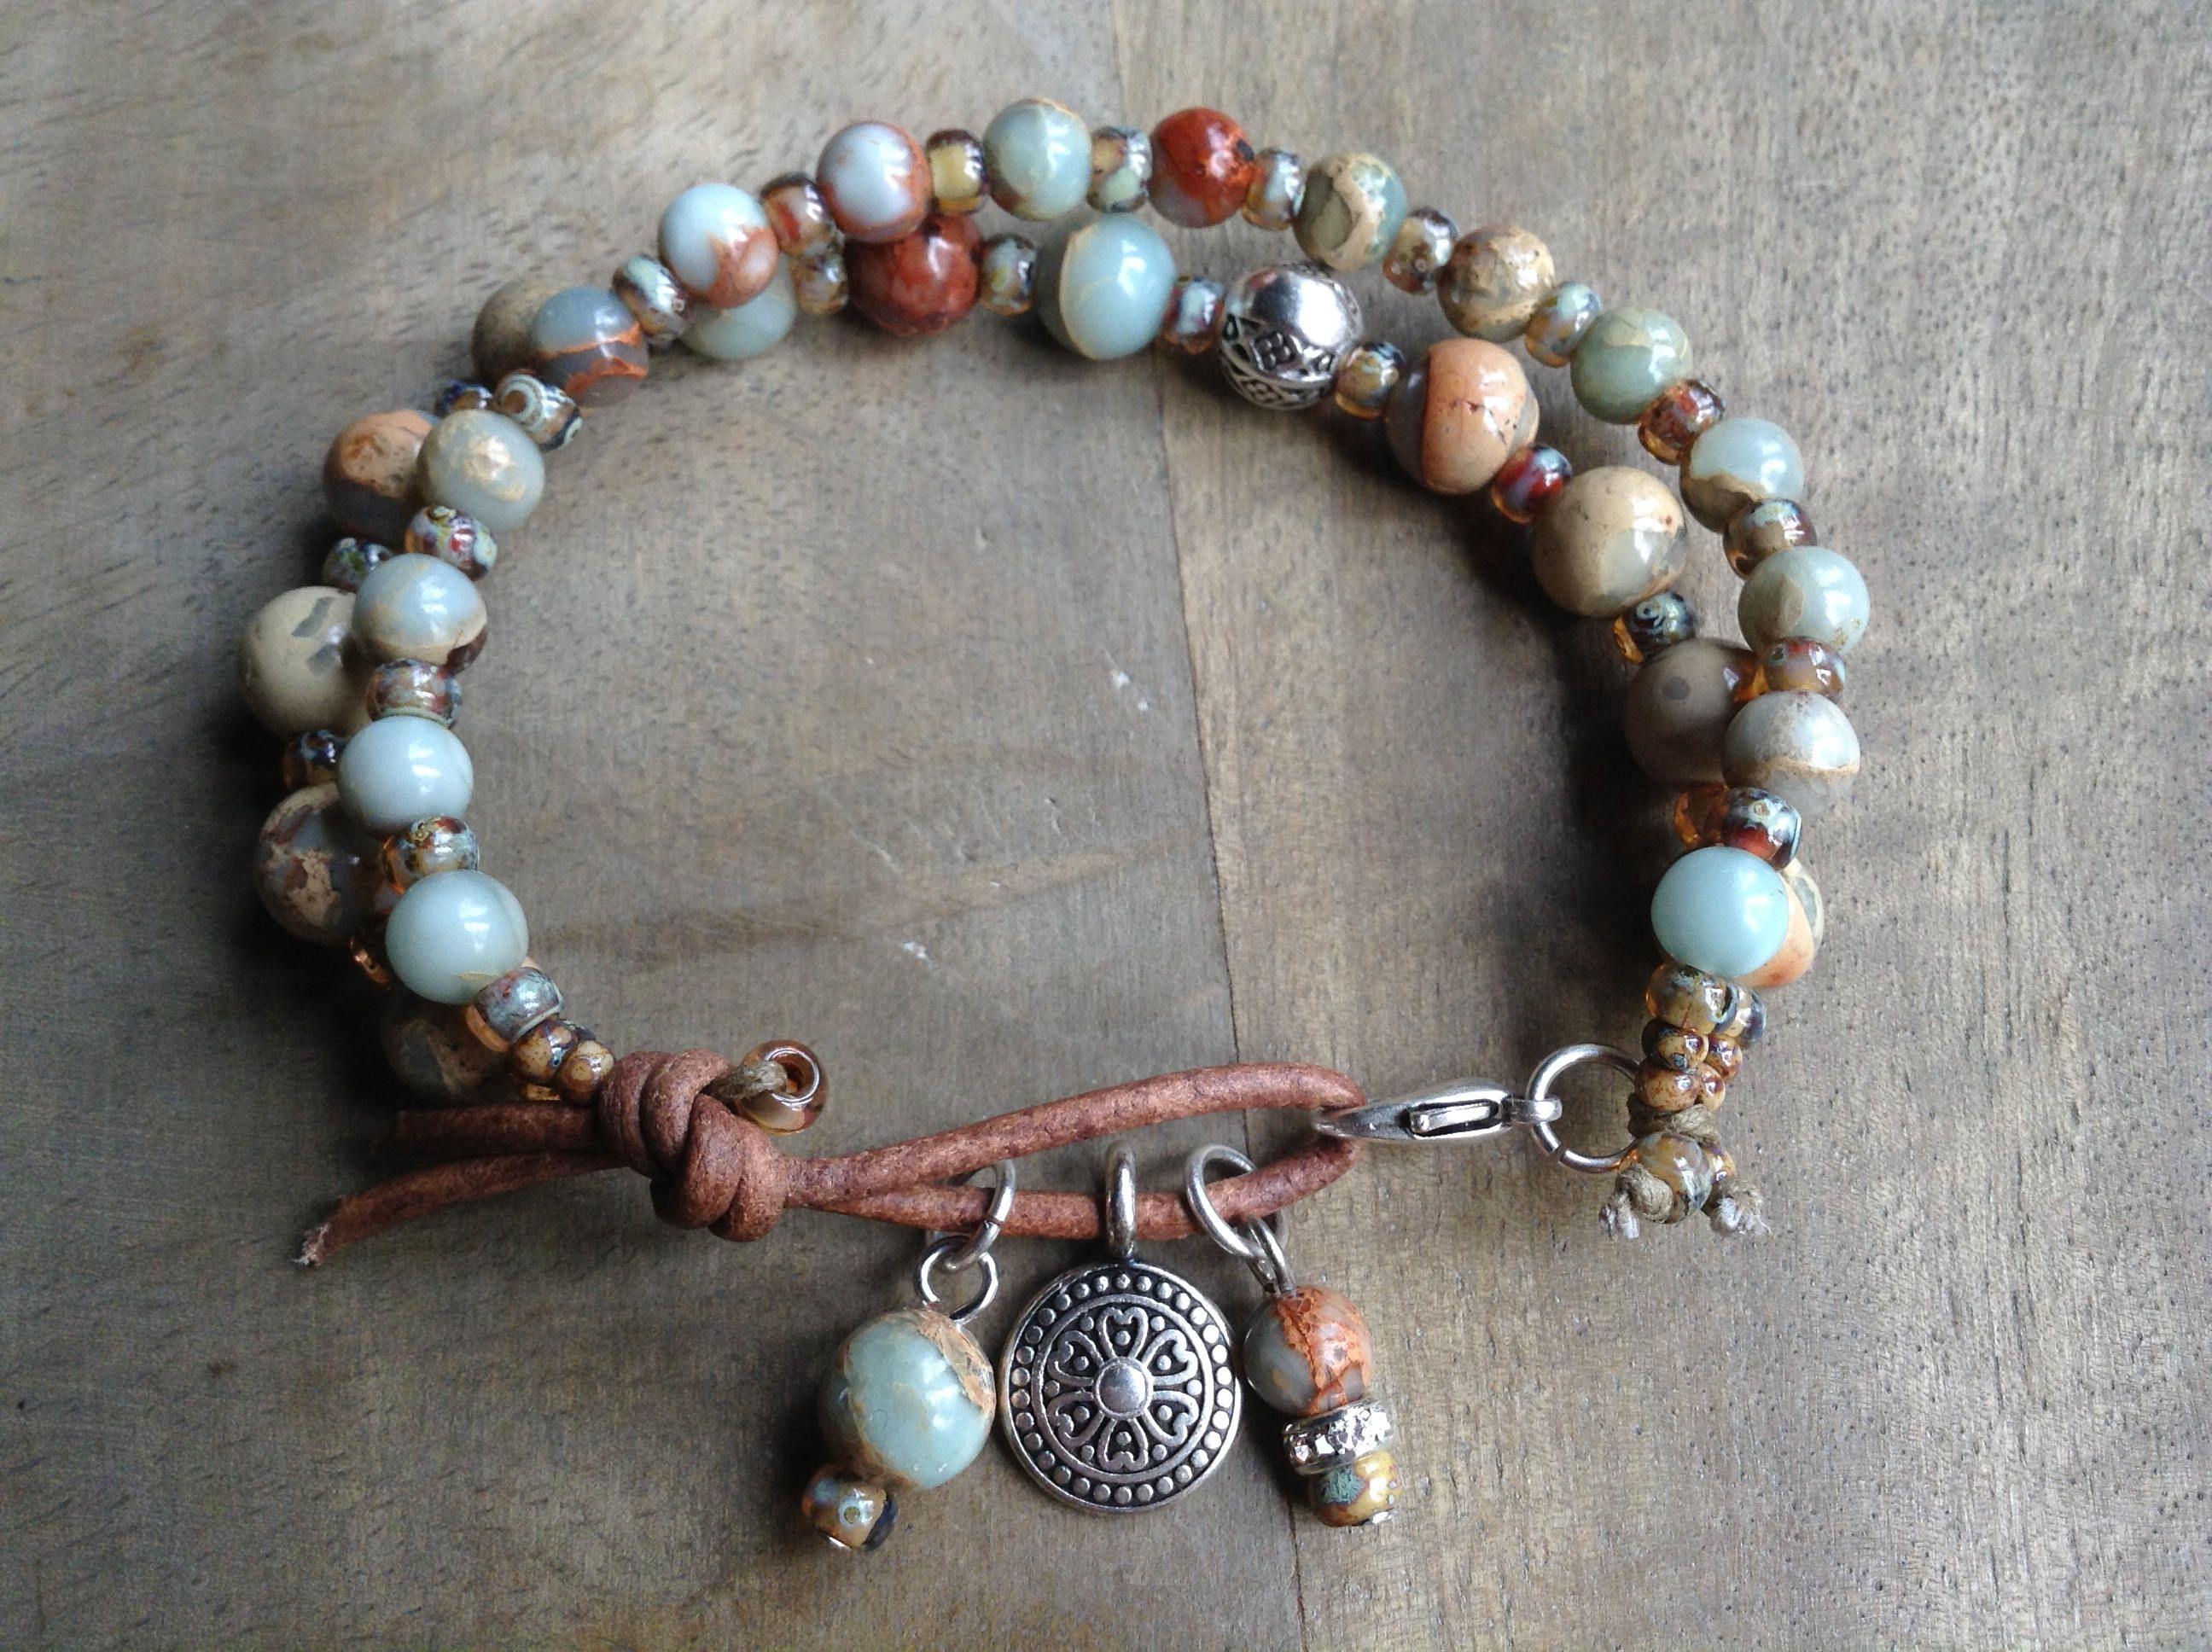 Cm wristimpression jasper bohemian bracelet boho chic bracelet